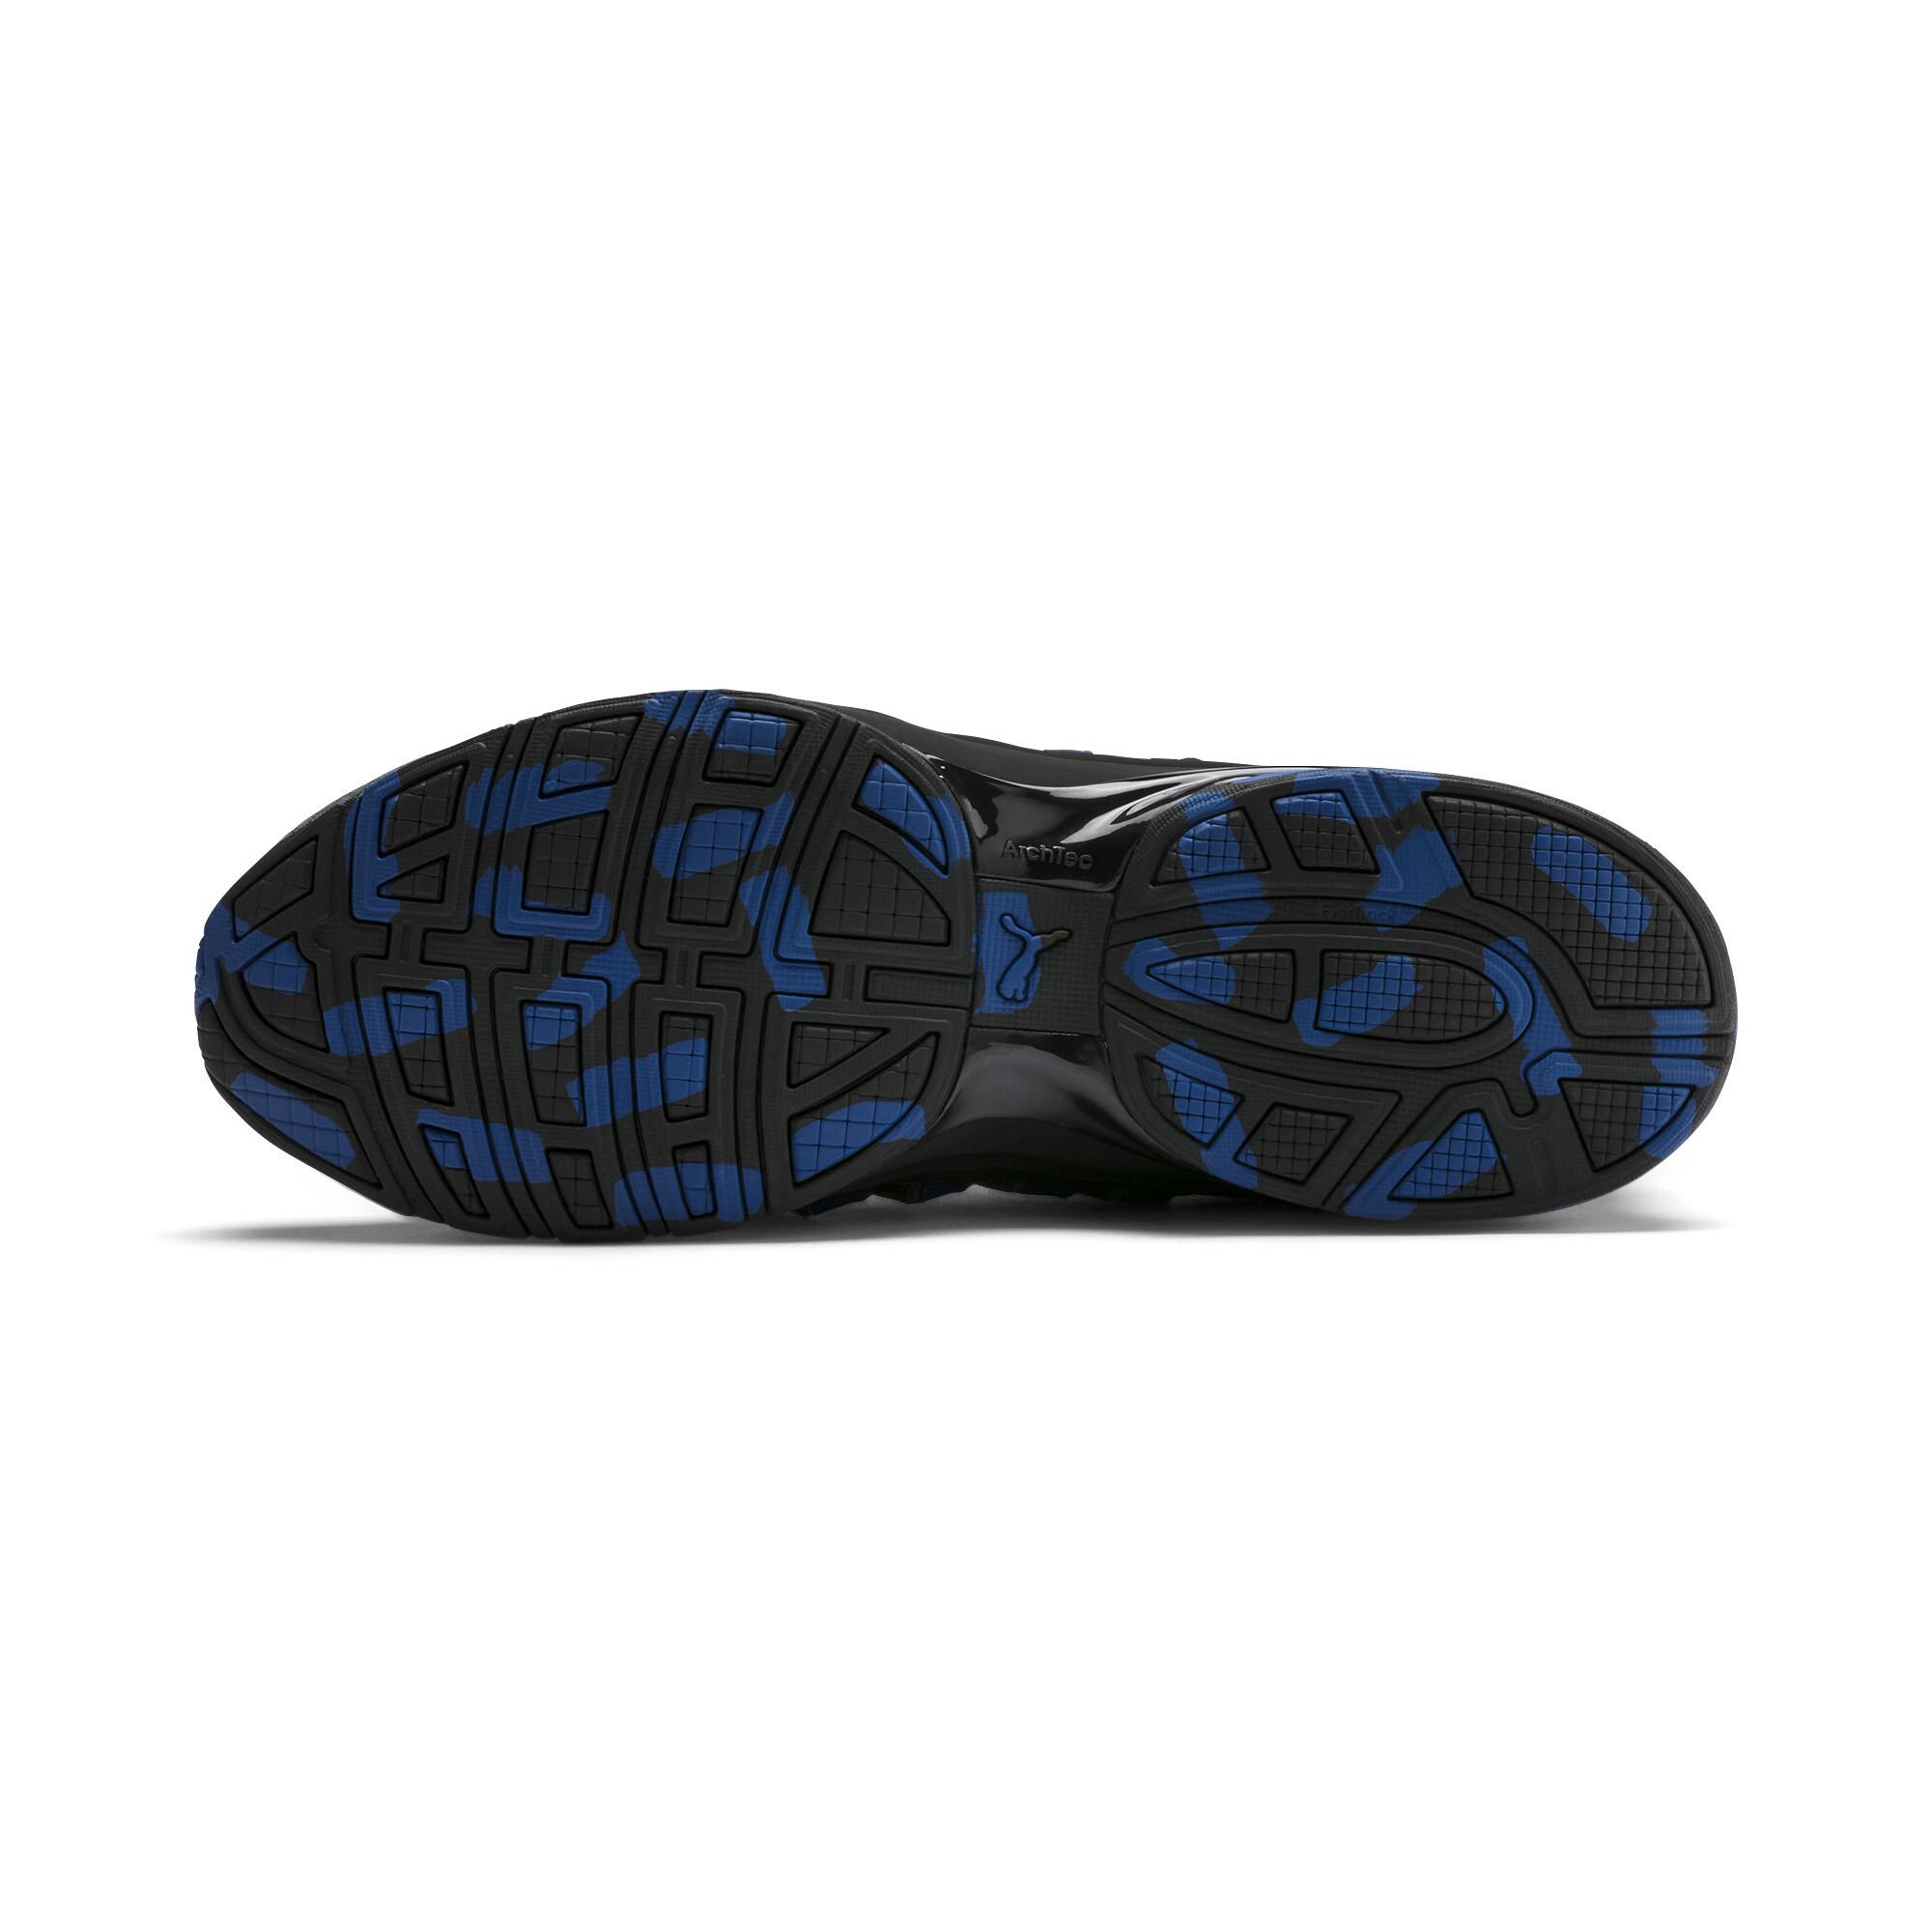 PUMA-Men-039-s-Axelion-Rip-Training-Shoes thumbnail 20